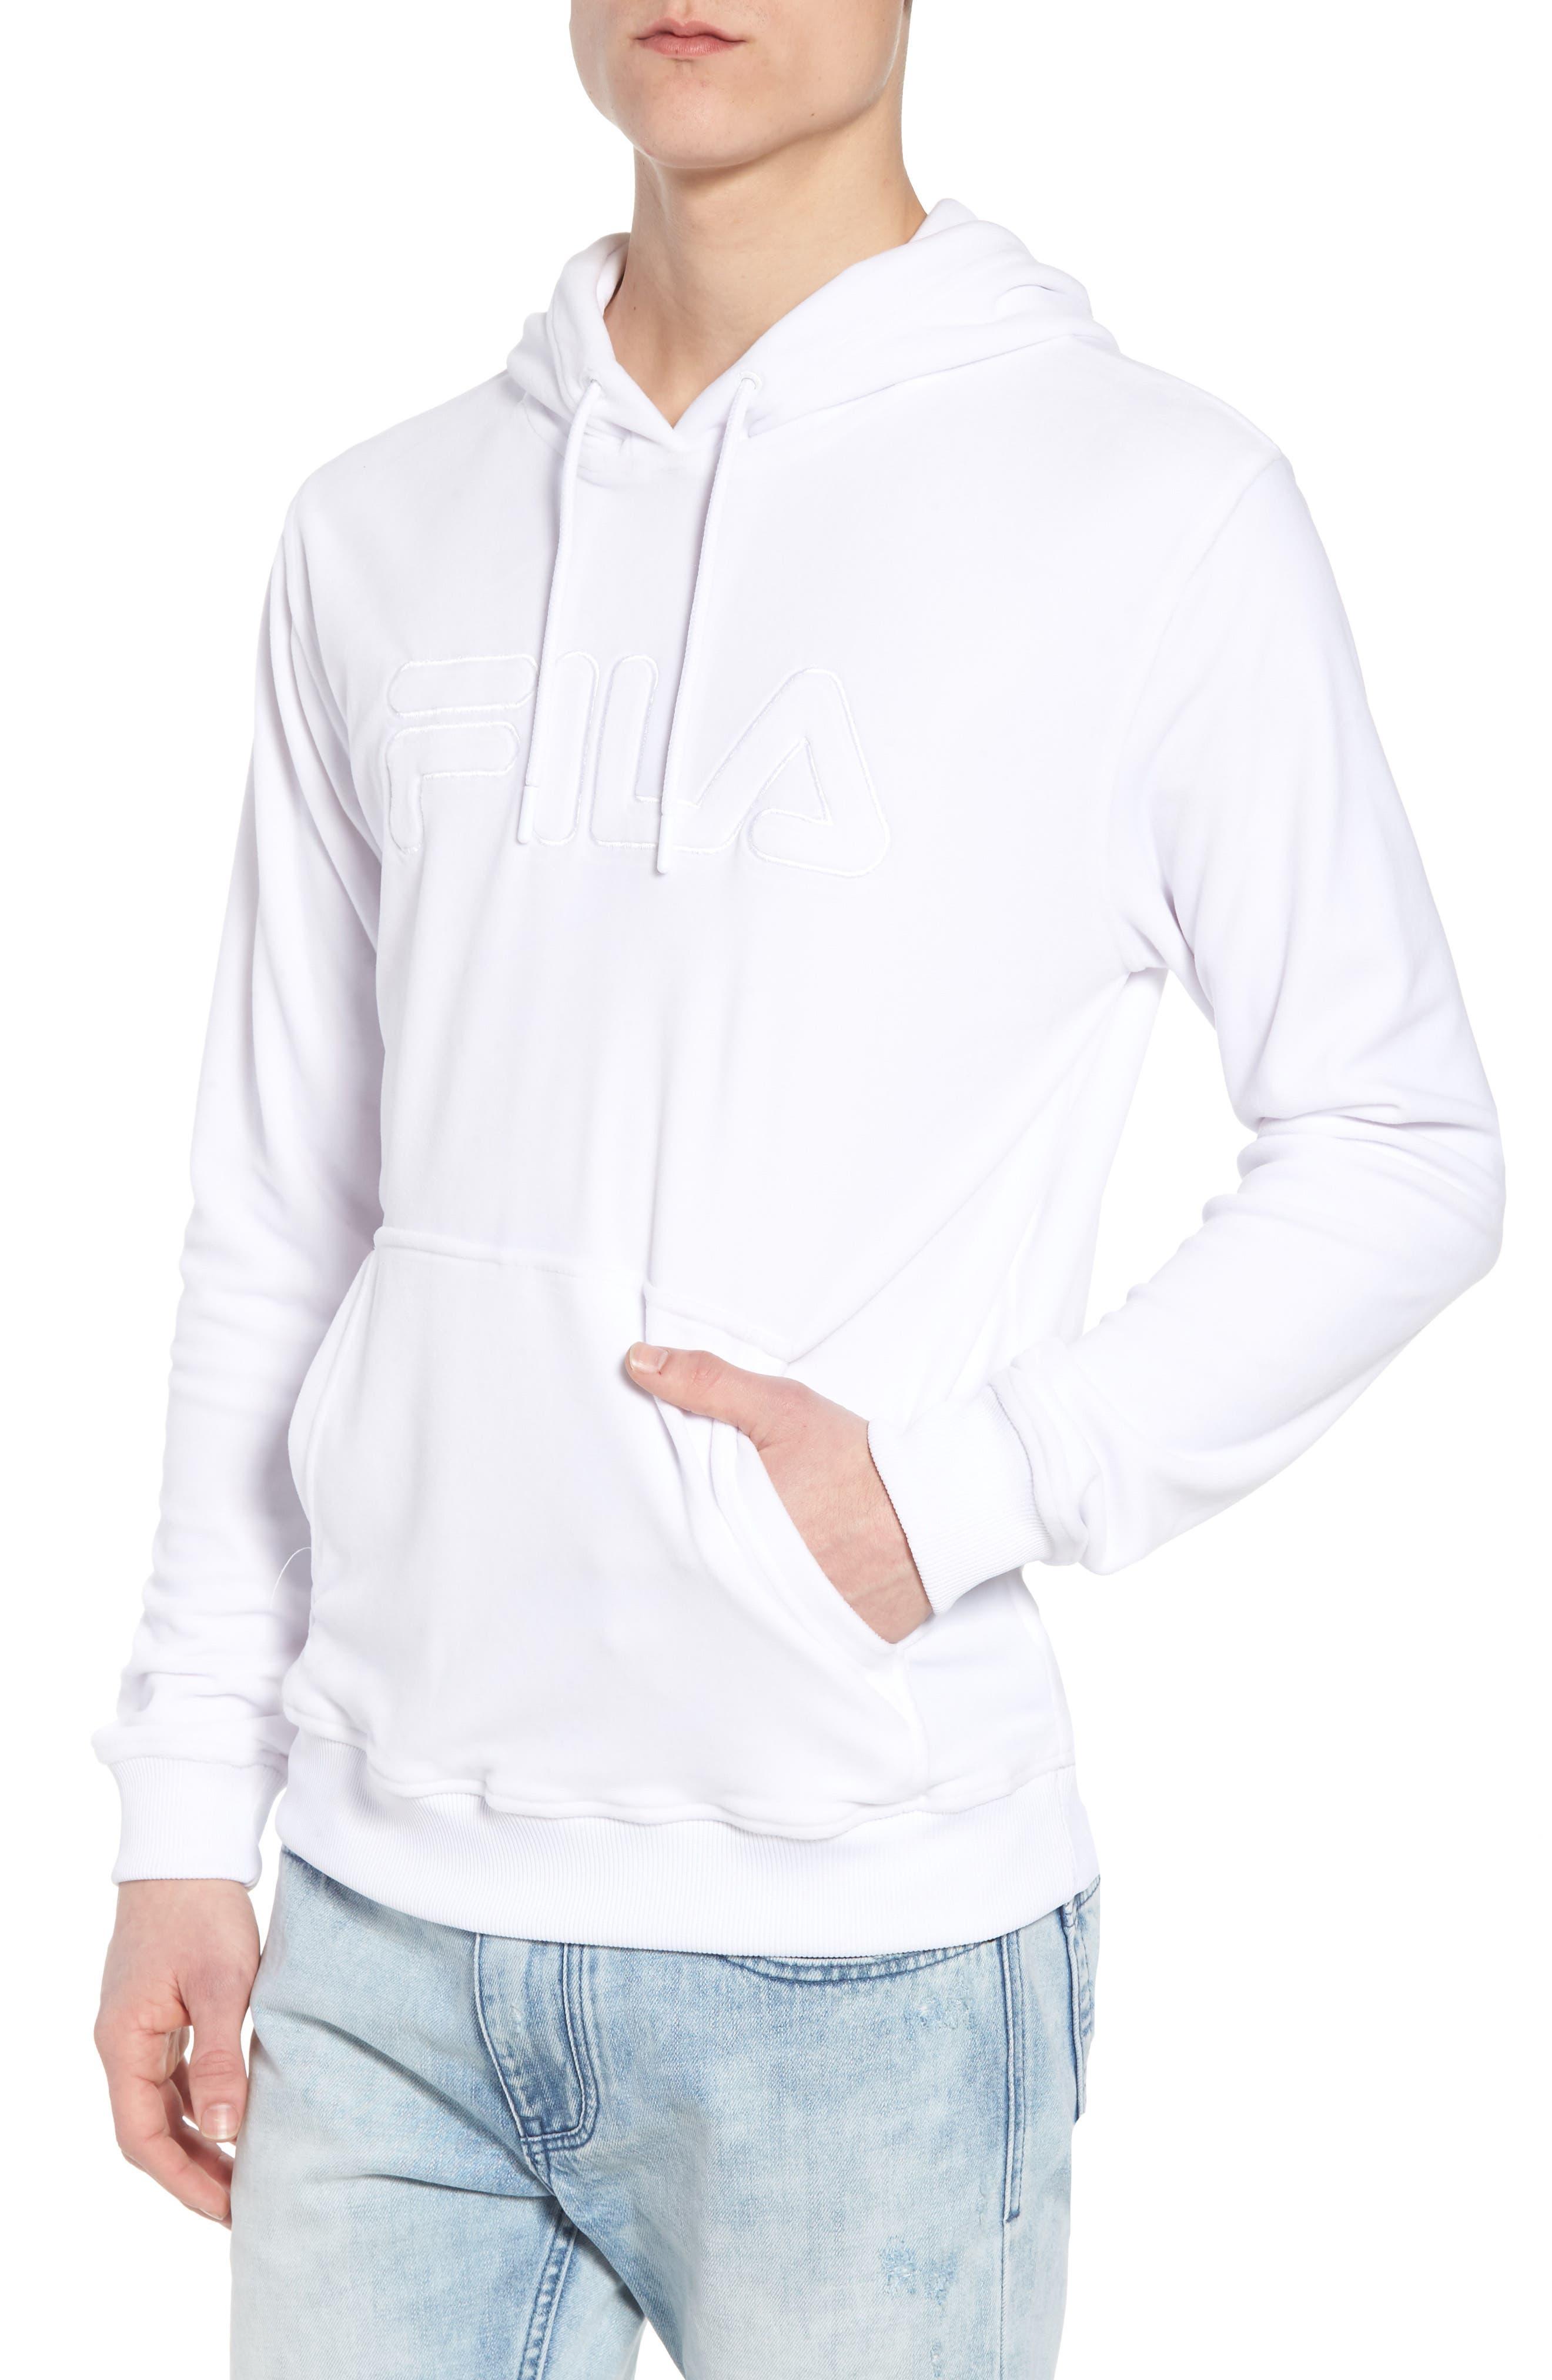 Asher Velour Hoodie Sweatshirt,                             Main thumbnail 1, color,                             100